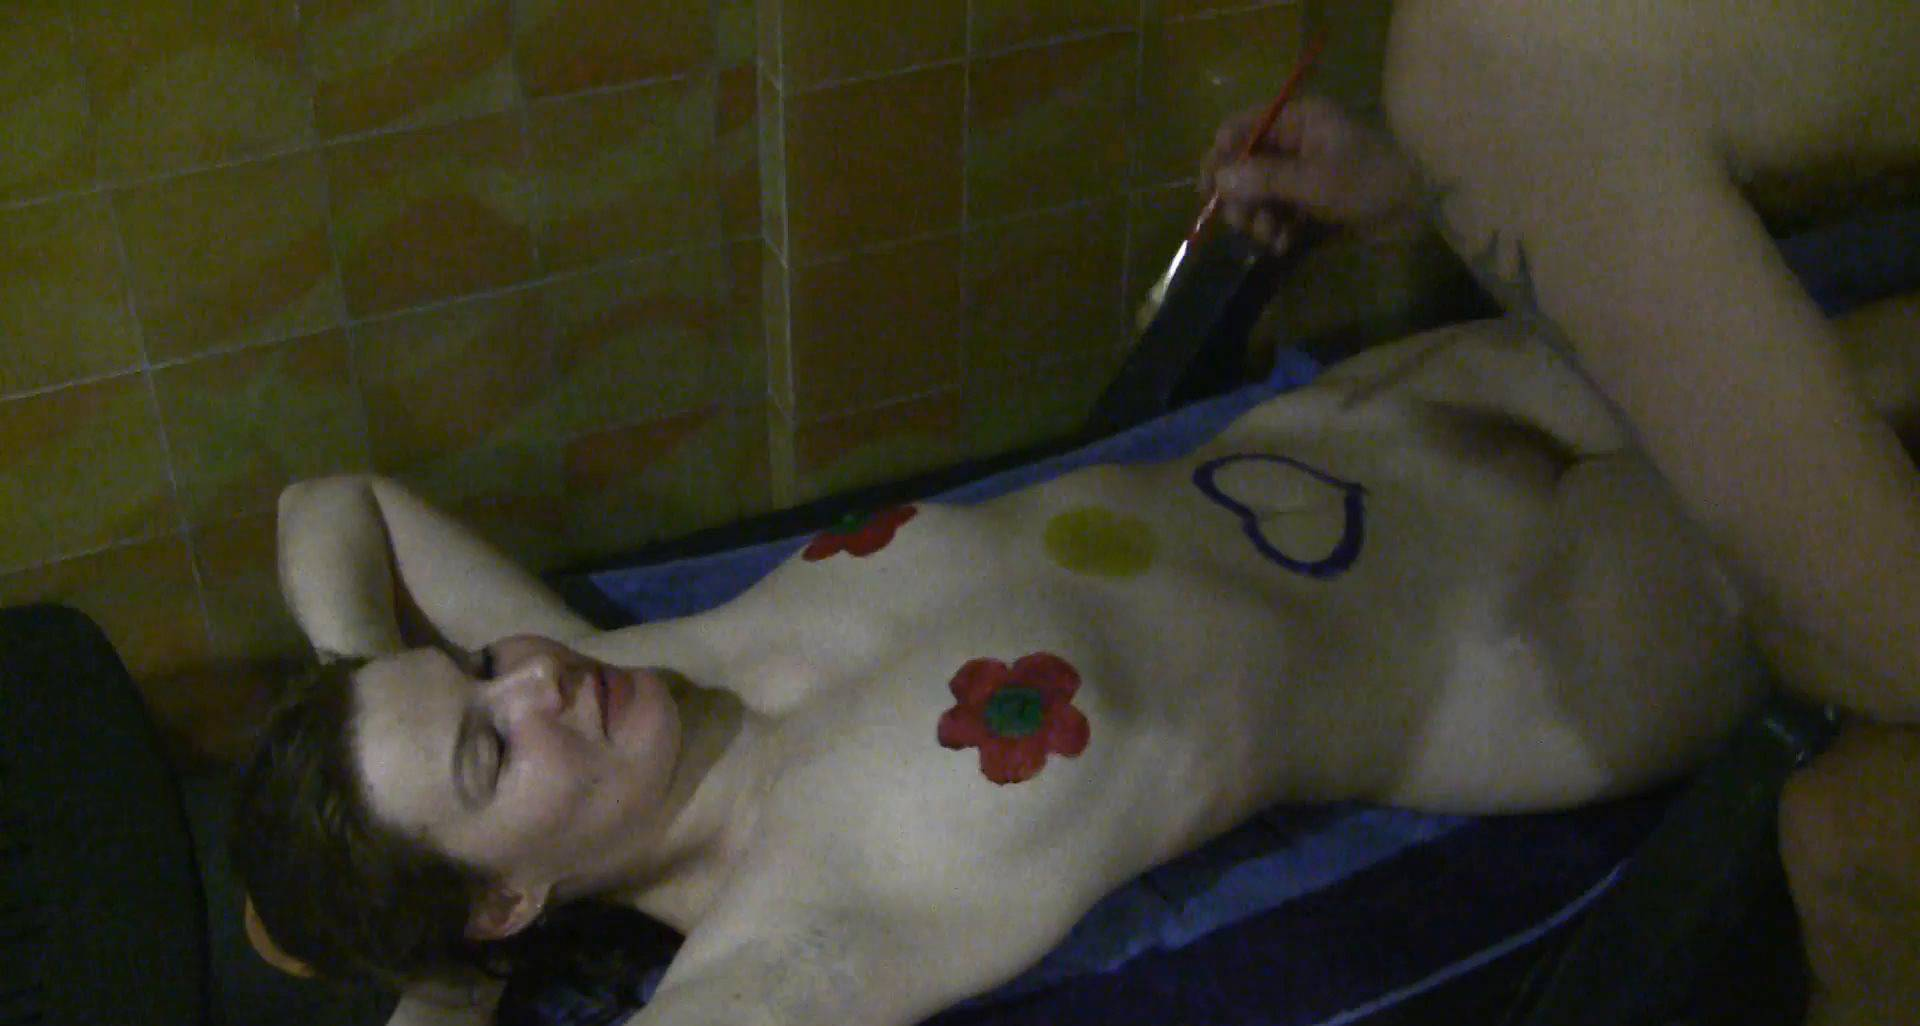 Nudist Movies Aqua Nude Relaxation - 2